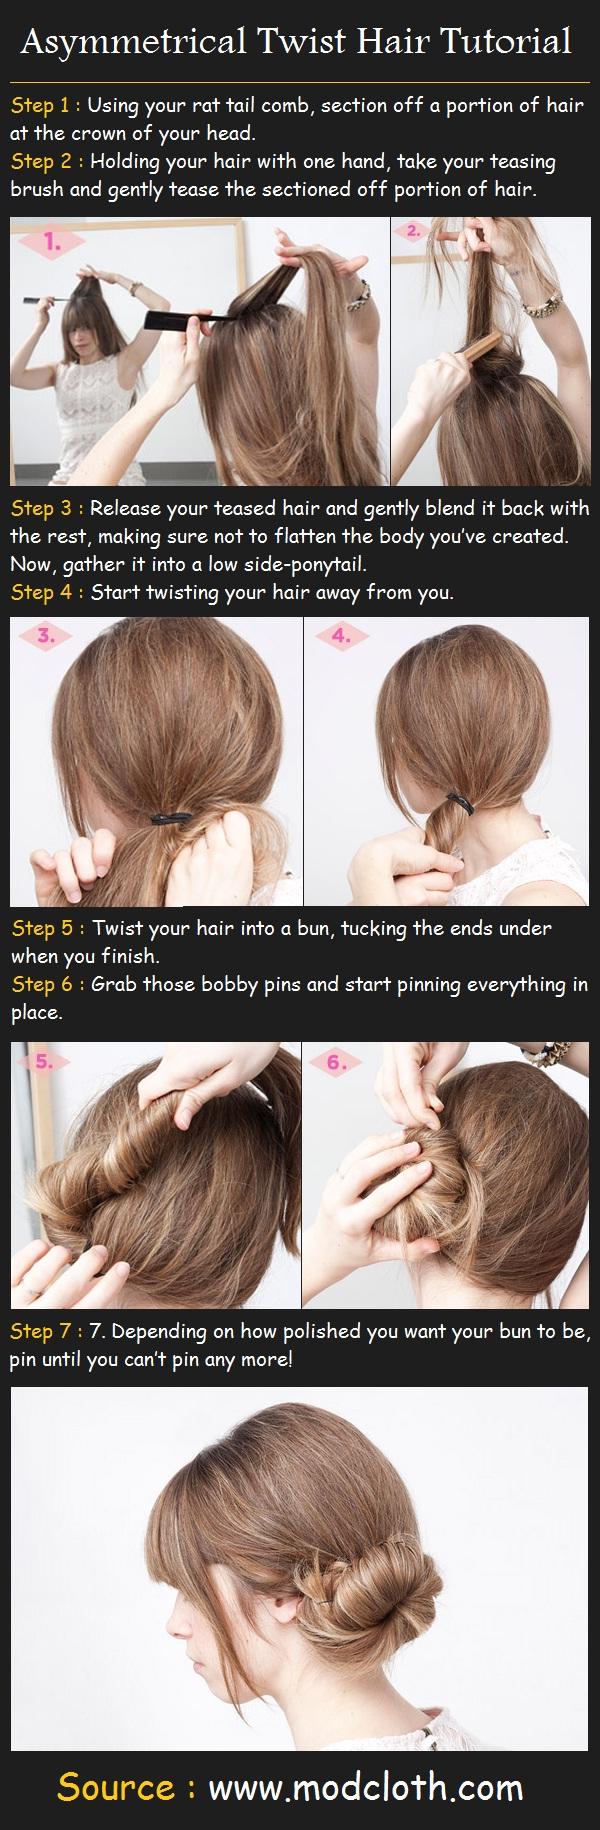 Beauty Tutorials: Asymmetrical Twist Hair Tutorial